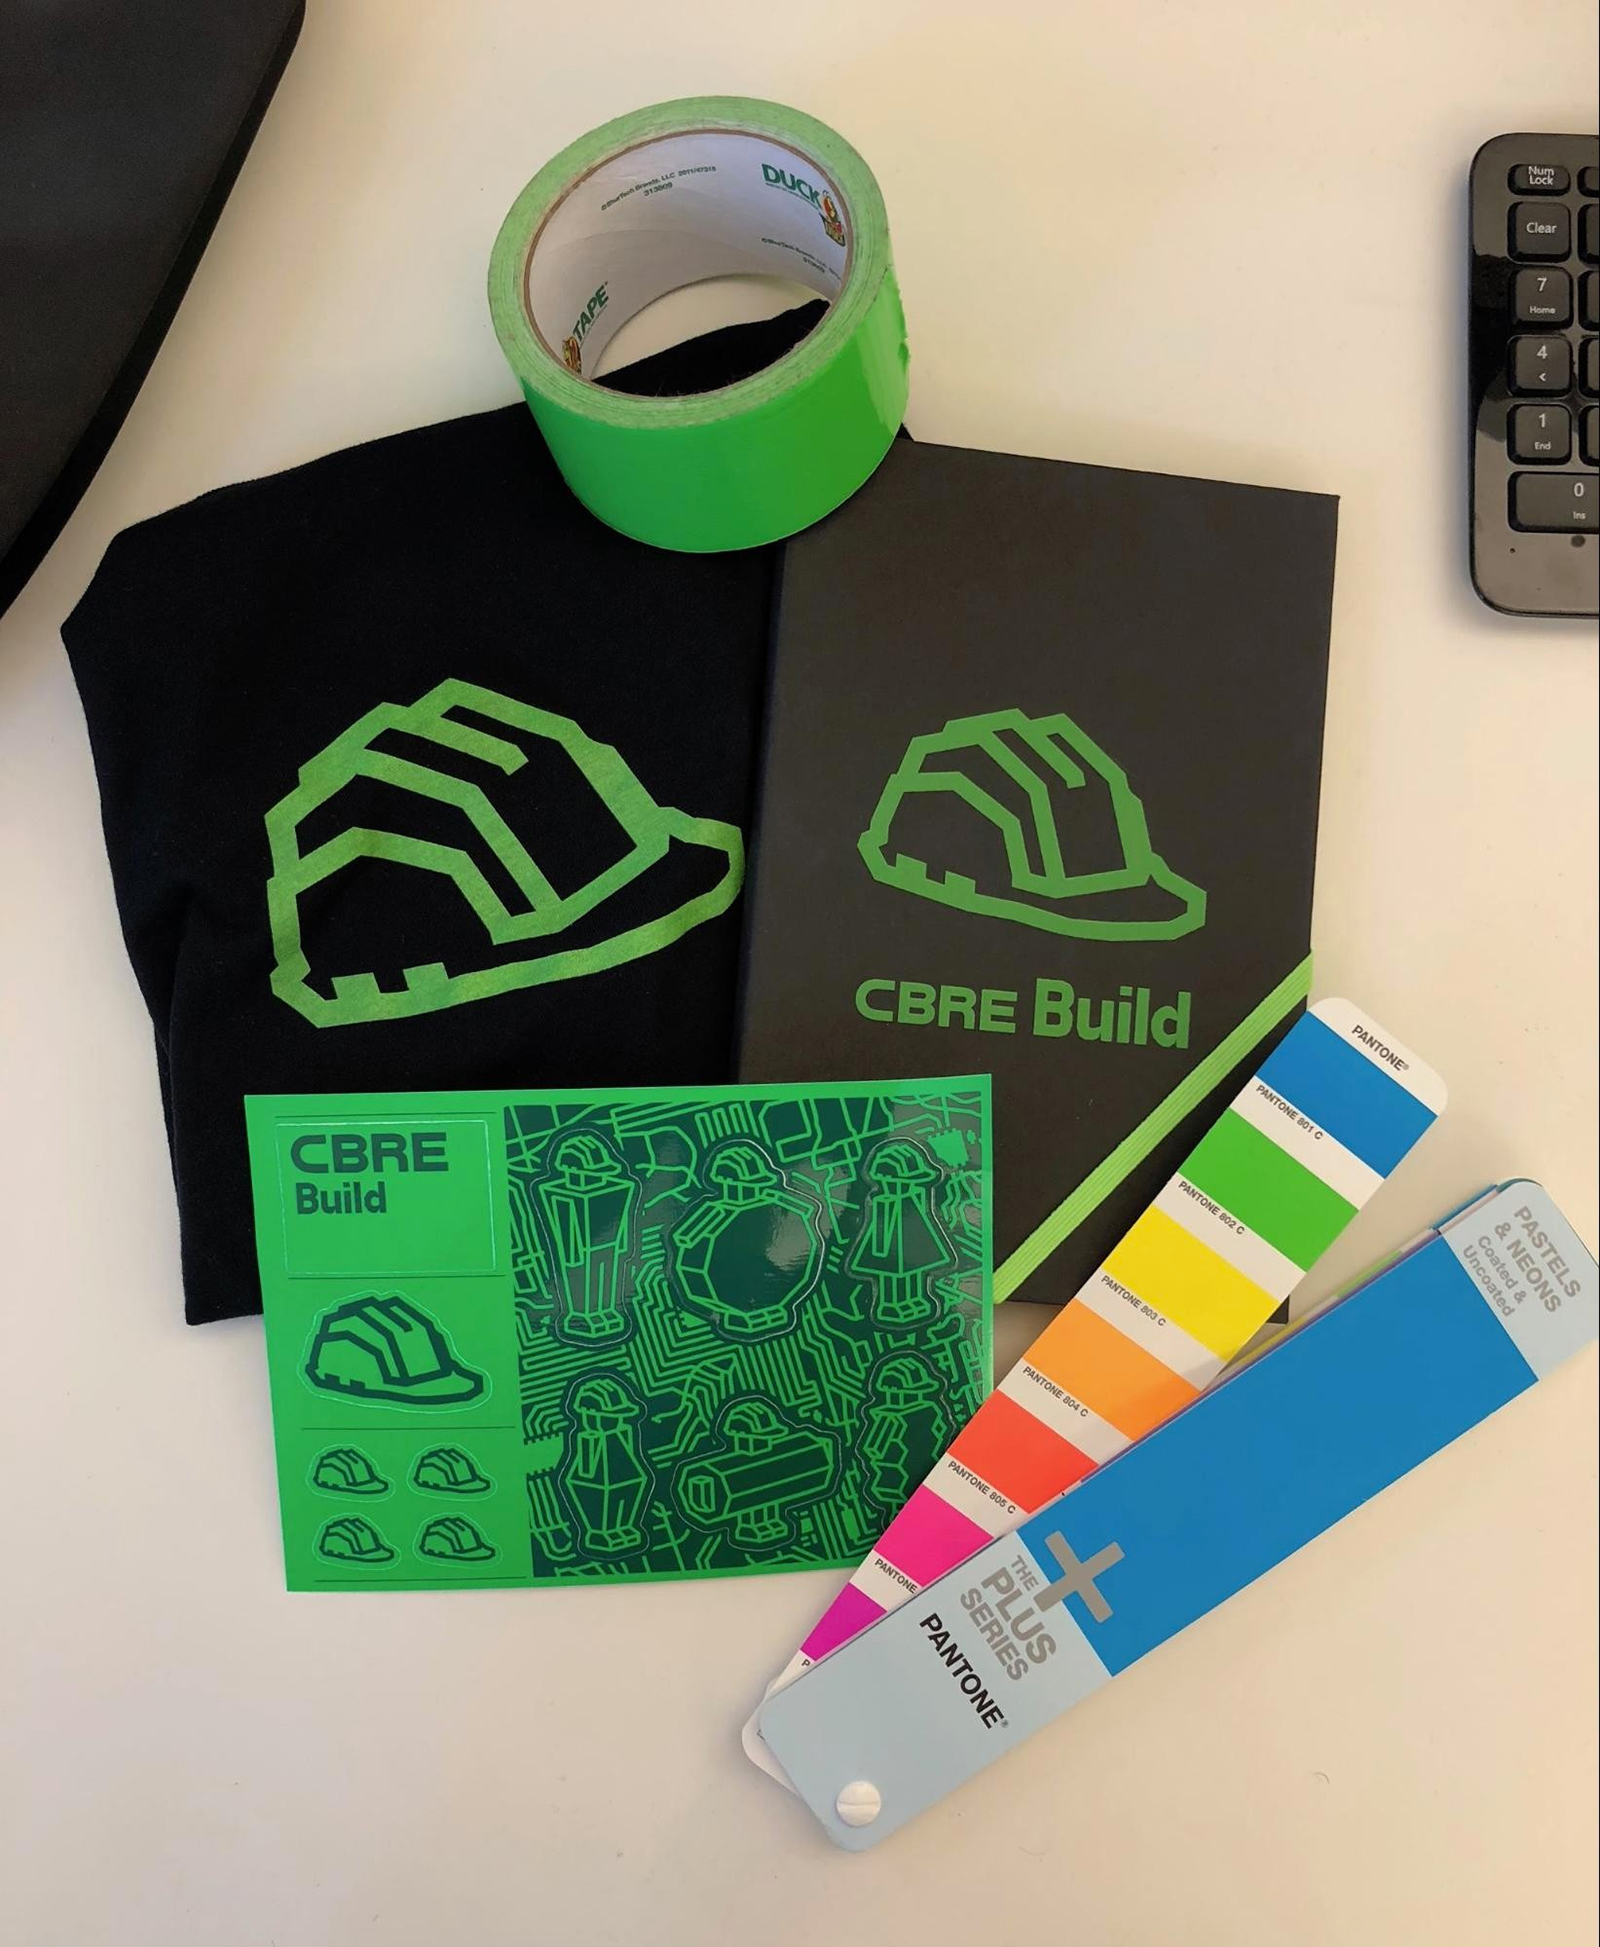 CBRE Build品牌啟動全新的LOGO和視覺VI形象-深圳VI設計7